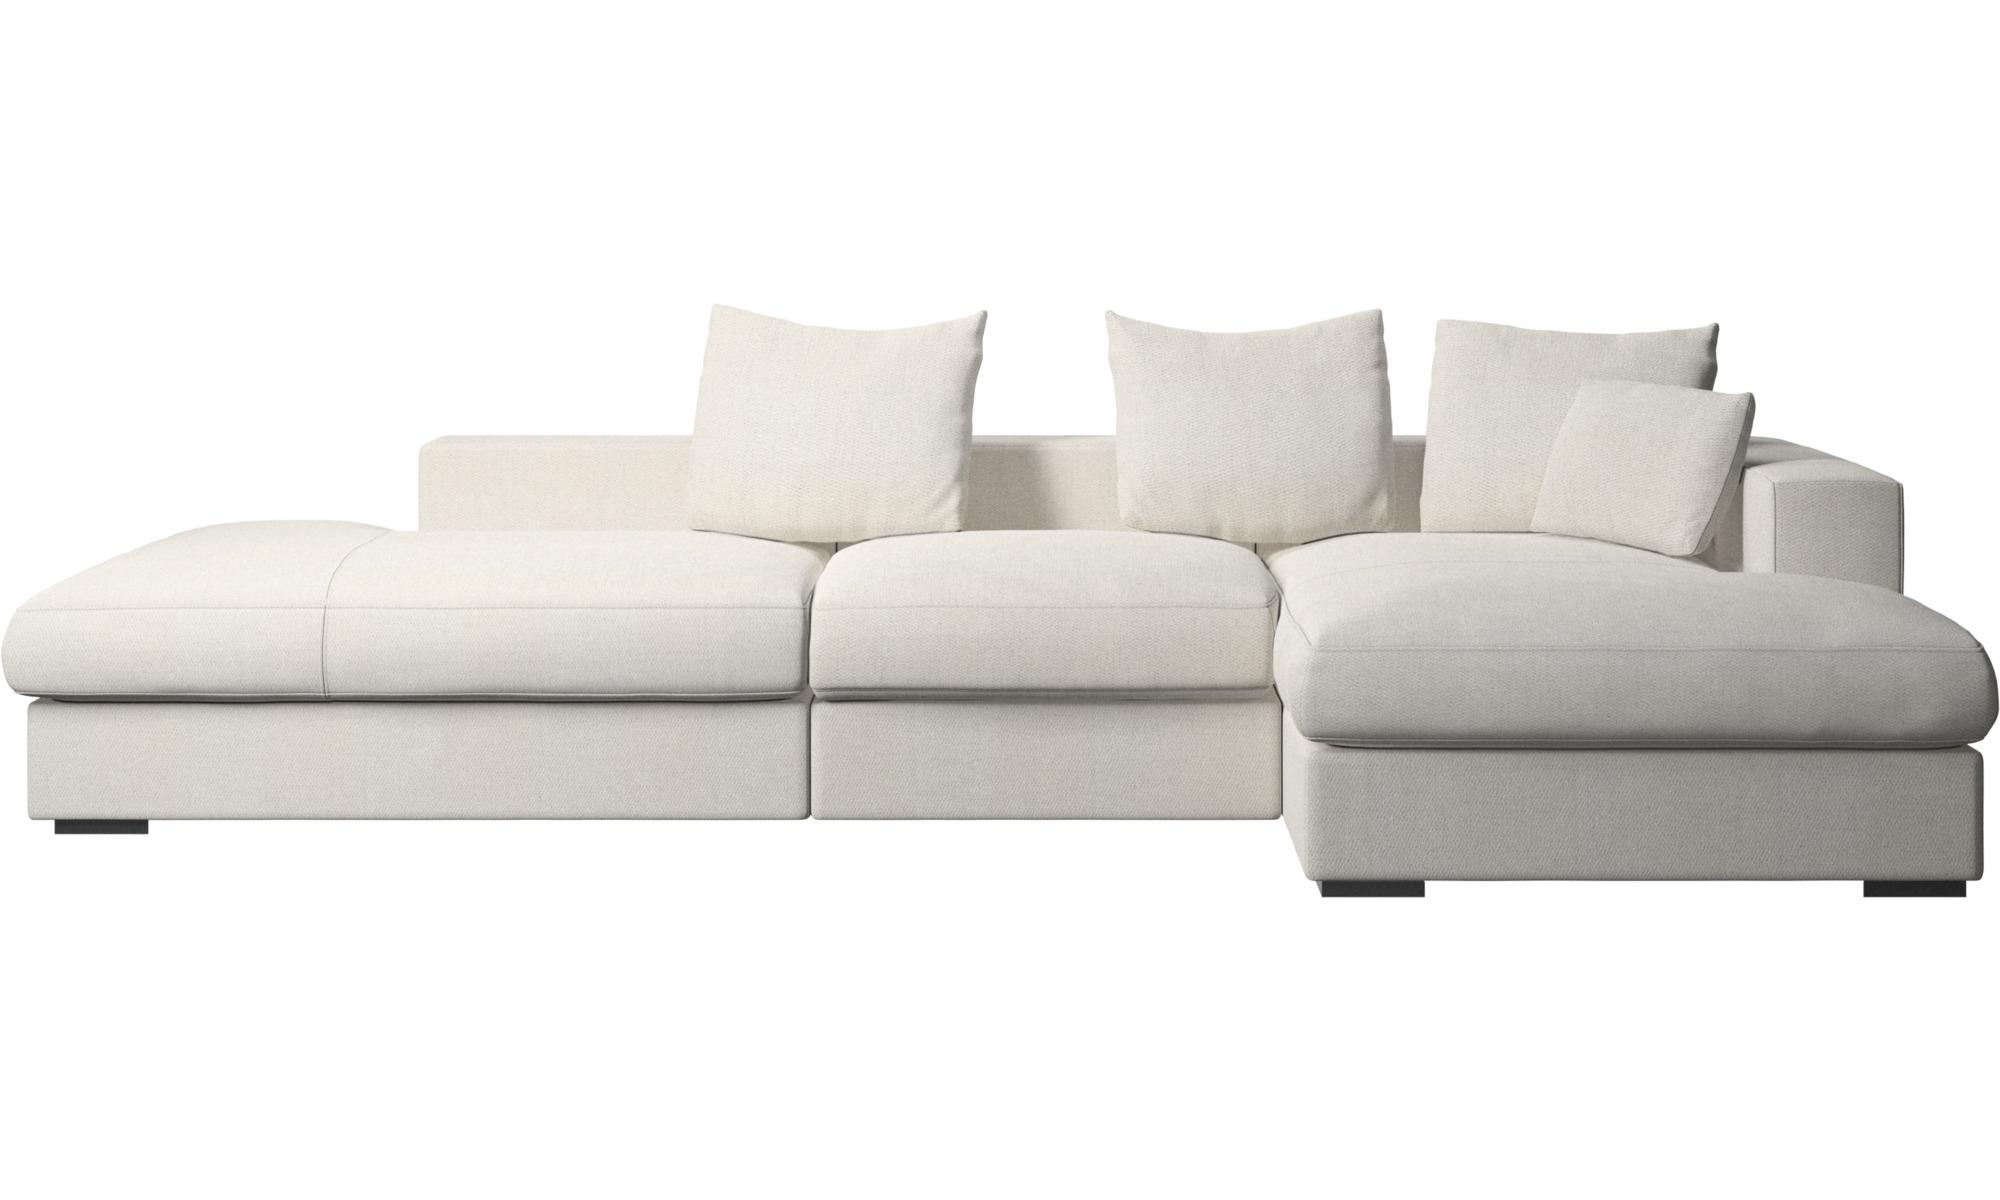 Full Size of Big Sofa Abnehmbarer Bezug Grau Hussen Waschbarer Ikea Abnehmbar Waschbar Mit Abnehmbaren Abnehmbarem Sofas Modulares Lounge Cenova Und Ruhemodul Boconcept Sofa Sofa Abnehmbarer Bezug